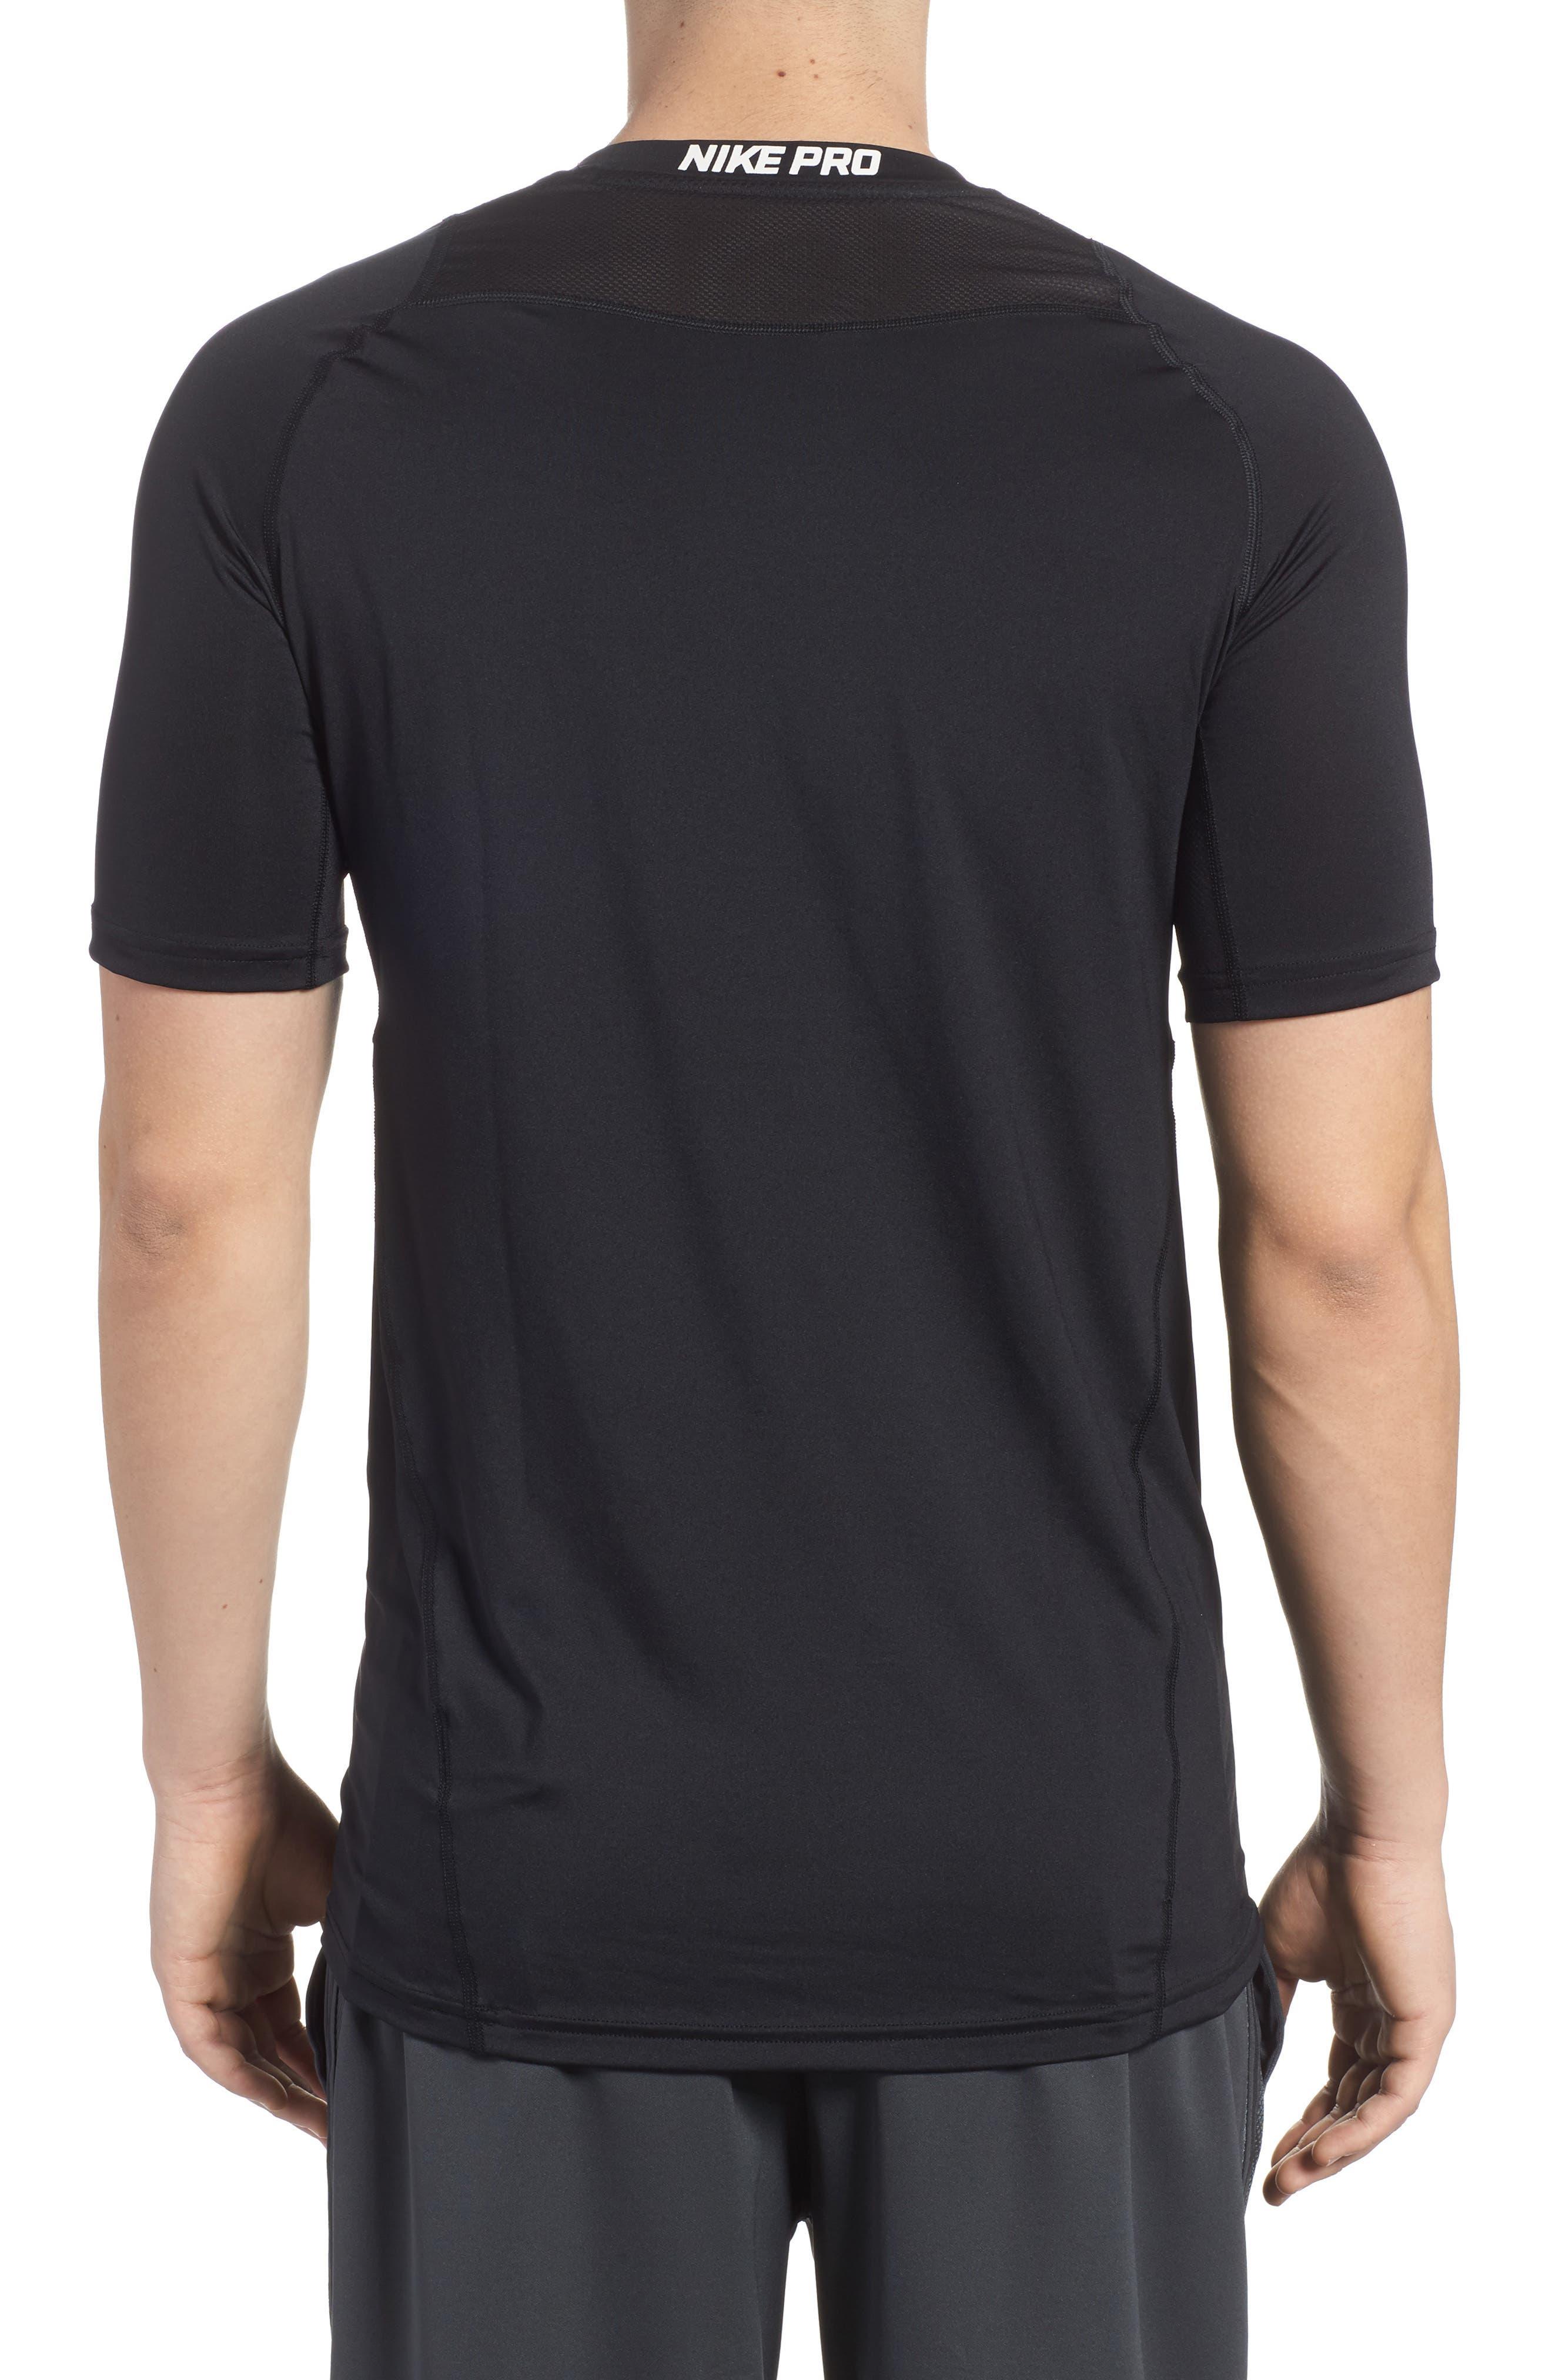 Pro Fitted T-Shirt,                             Alternate thumbnail 2, color,                             Black/White/White